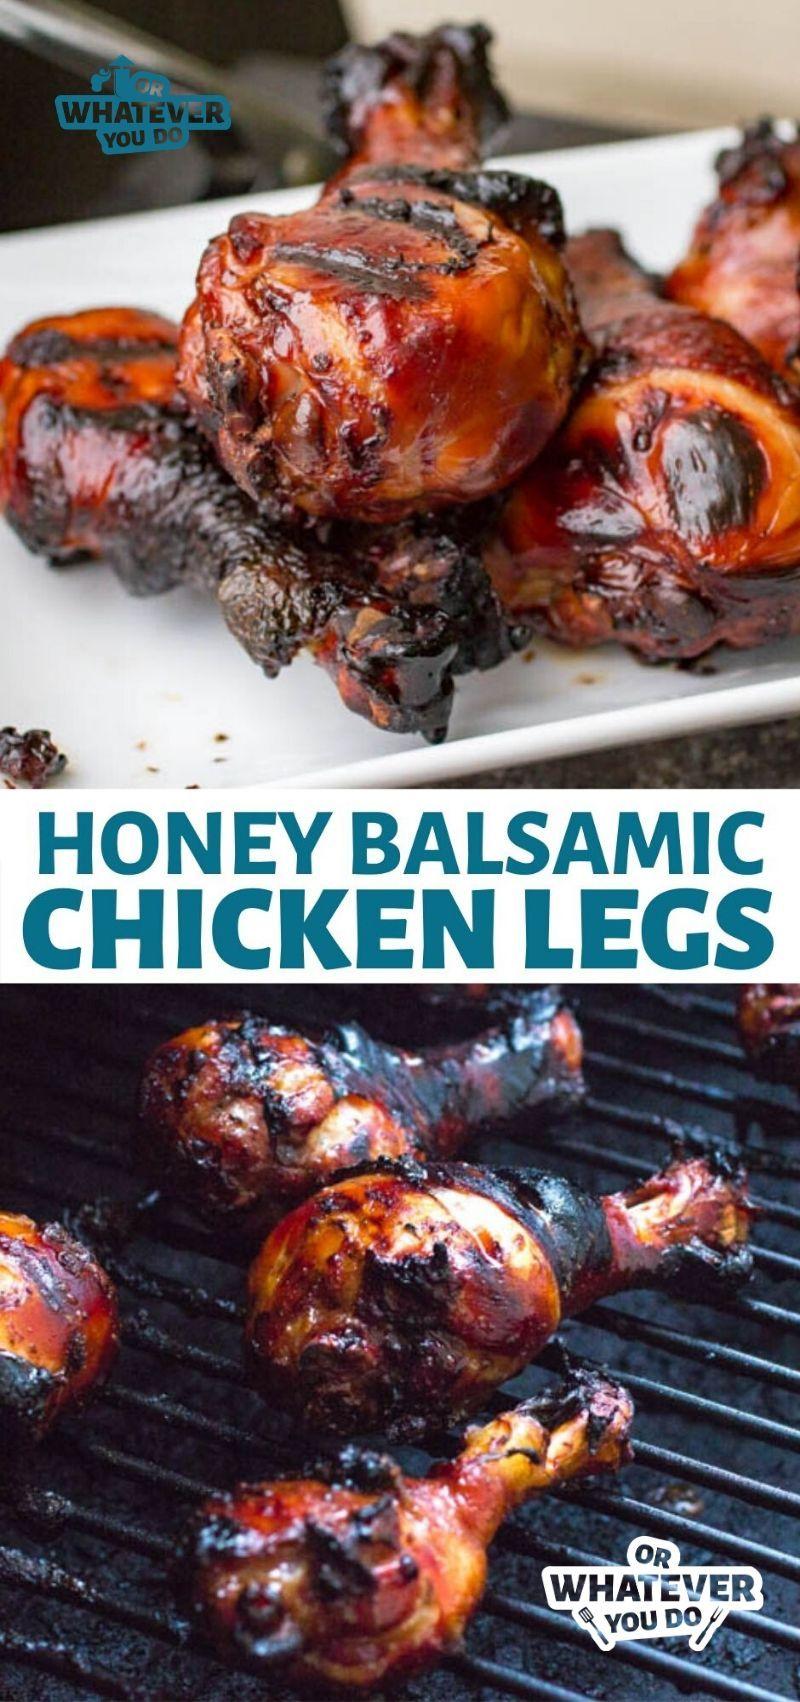 Honey Balsamic Traeger Grilled Chicken Legs | Wood-Pellet ...